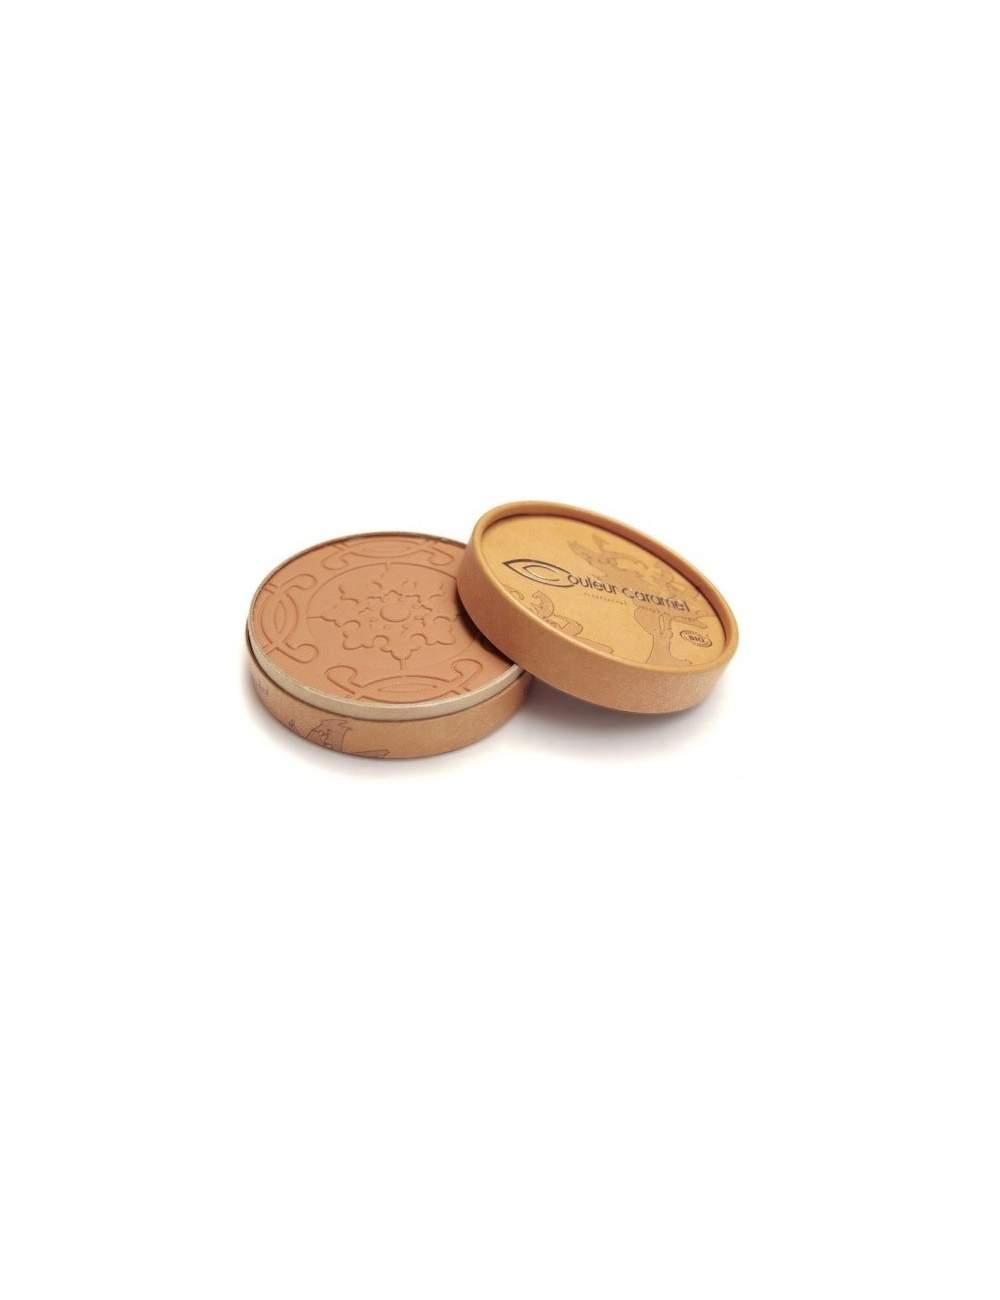 Polvos Bronceadores Bio Mate Terre Caramel 26 Beige Brown. Couleur Caramel